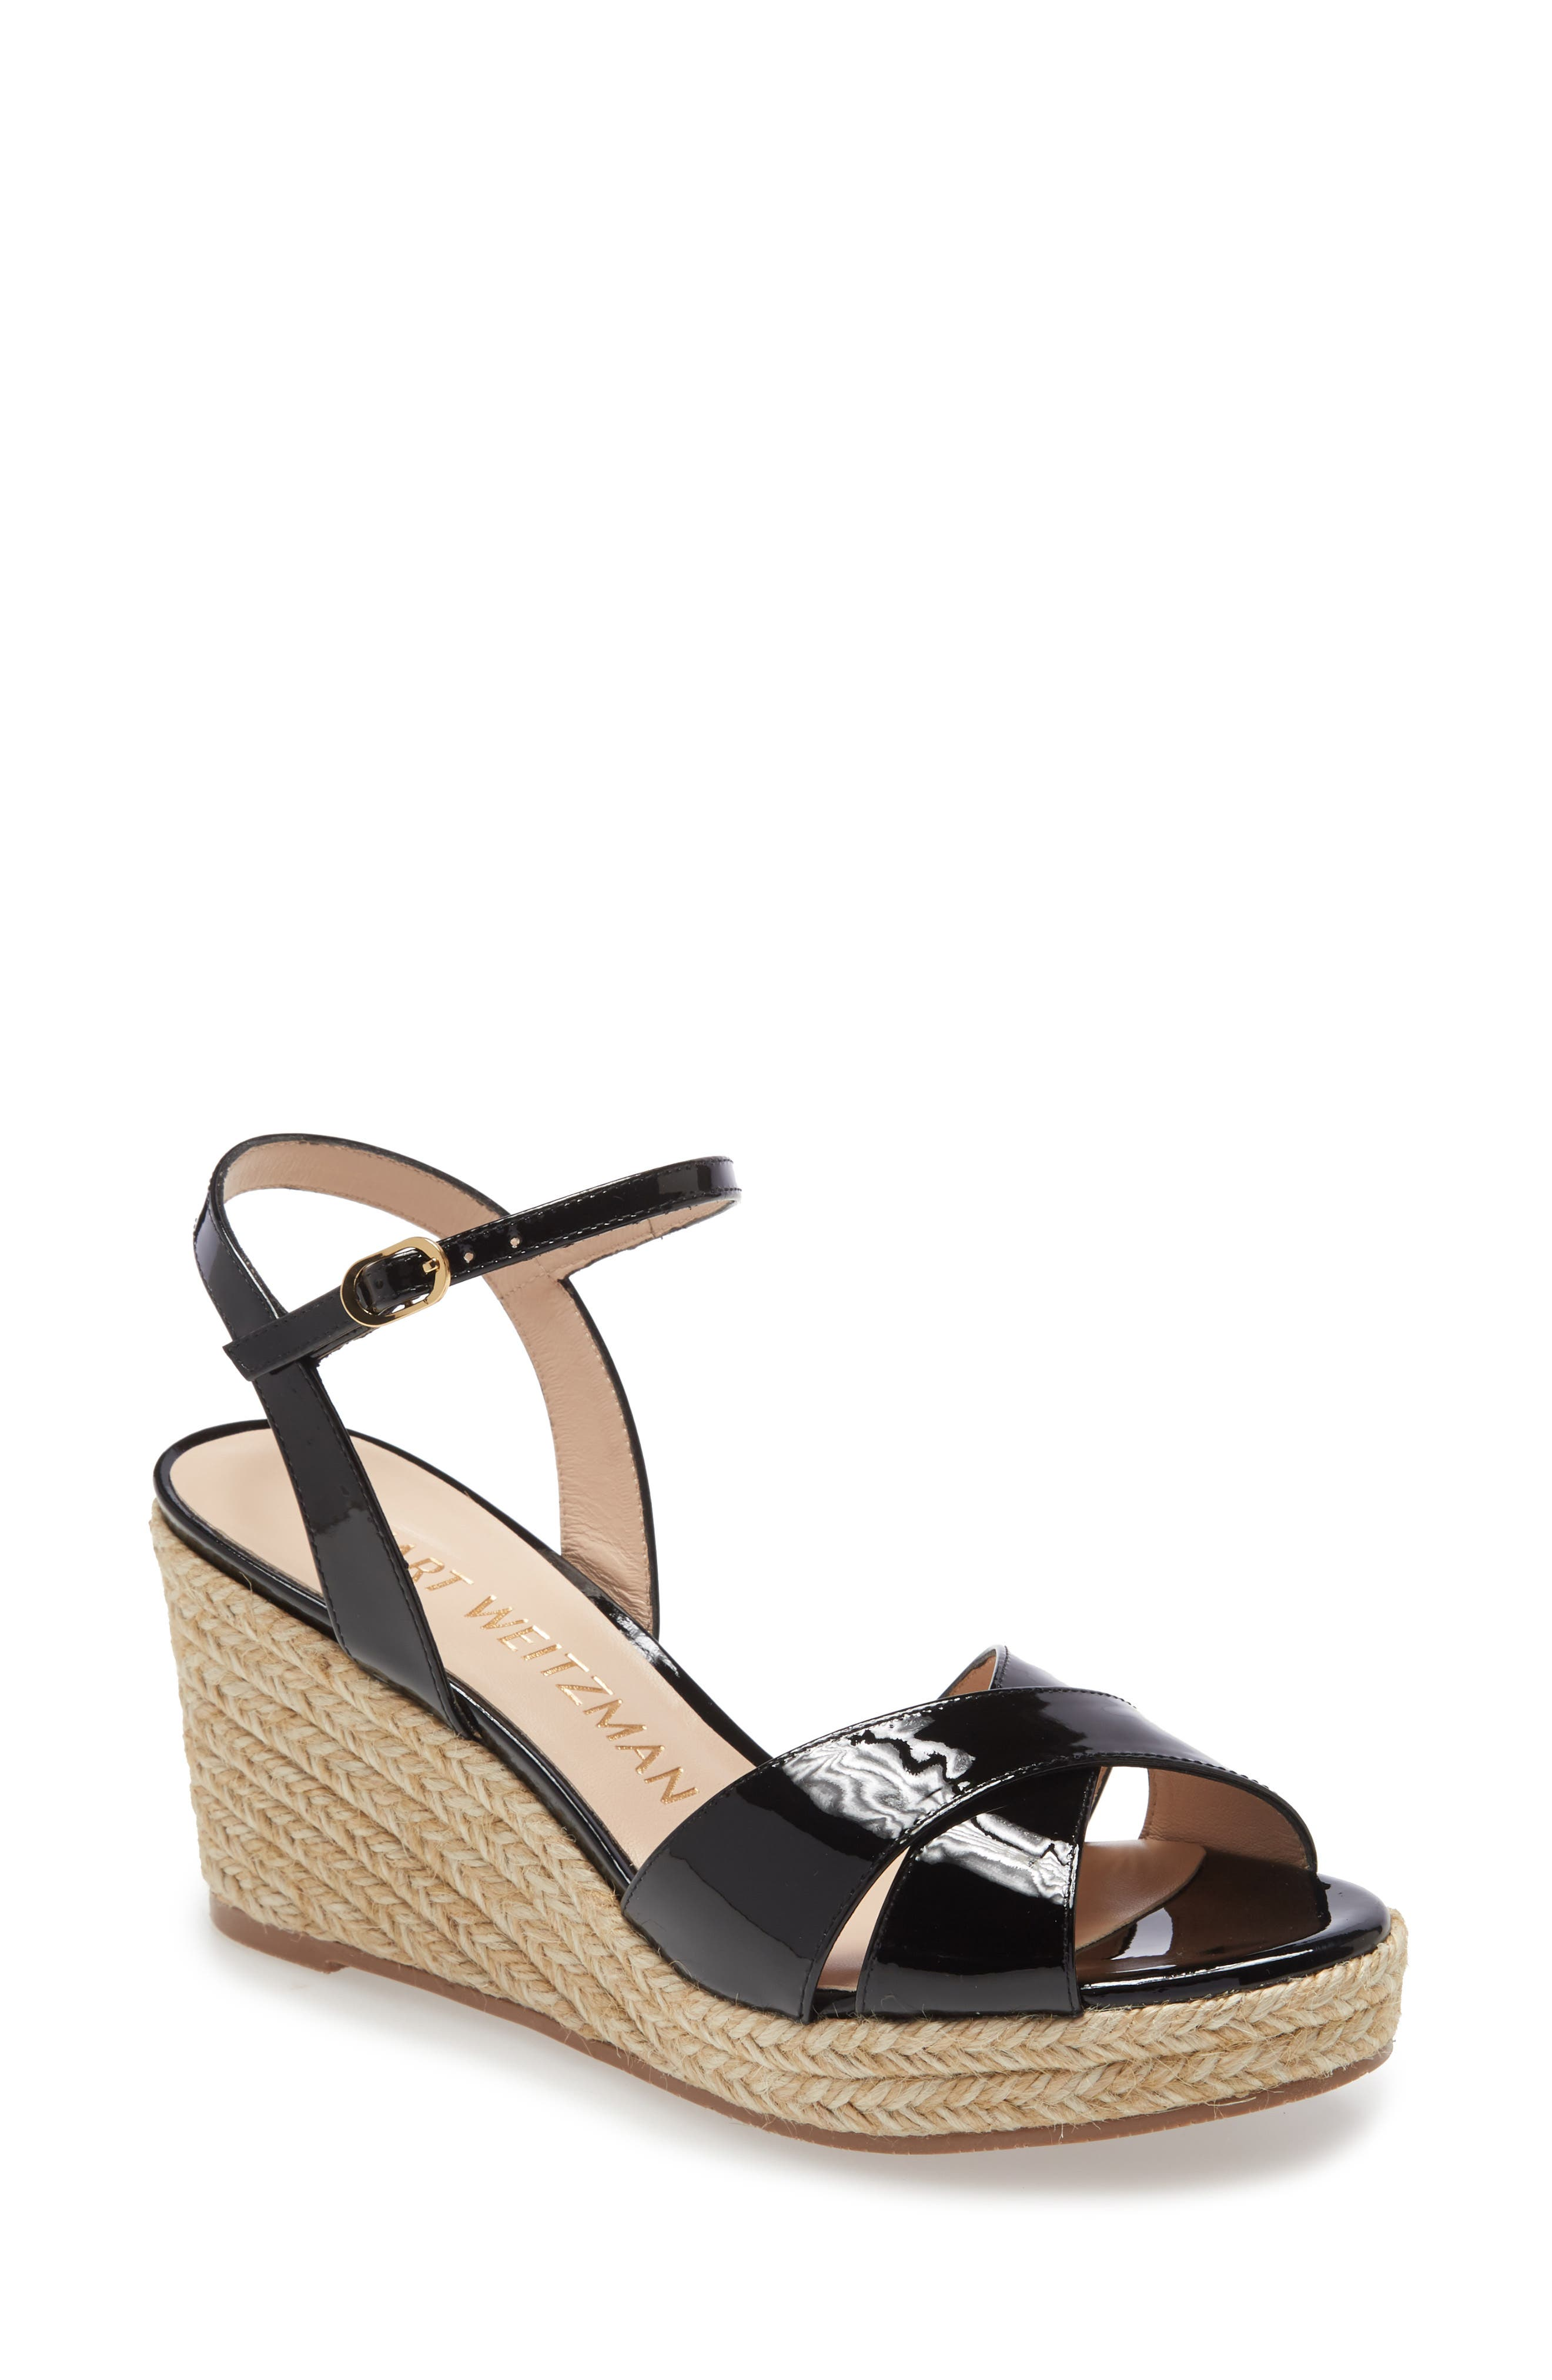 Women's Wedges Stuart Weitzman Shoes